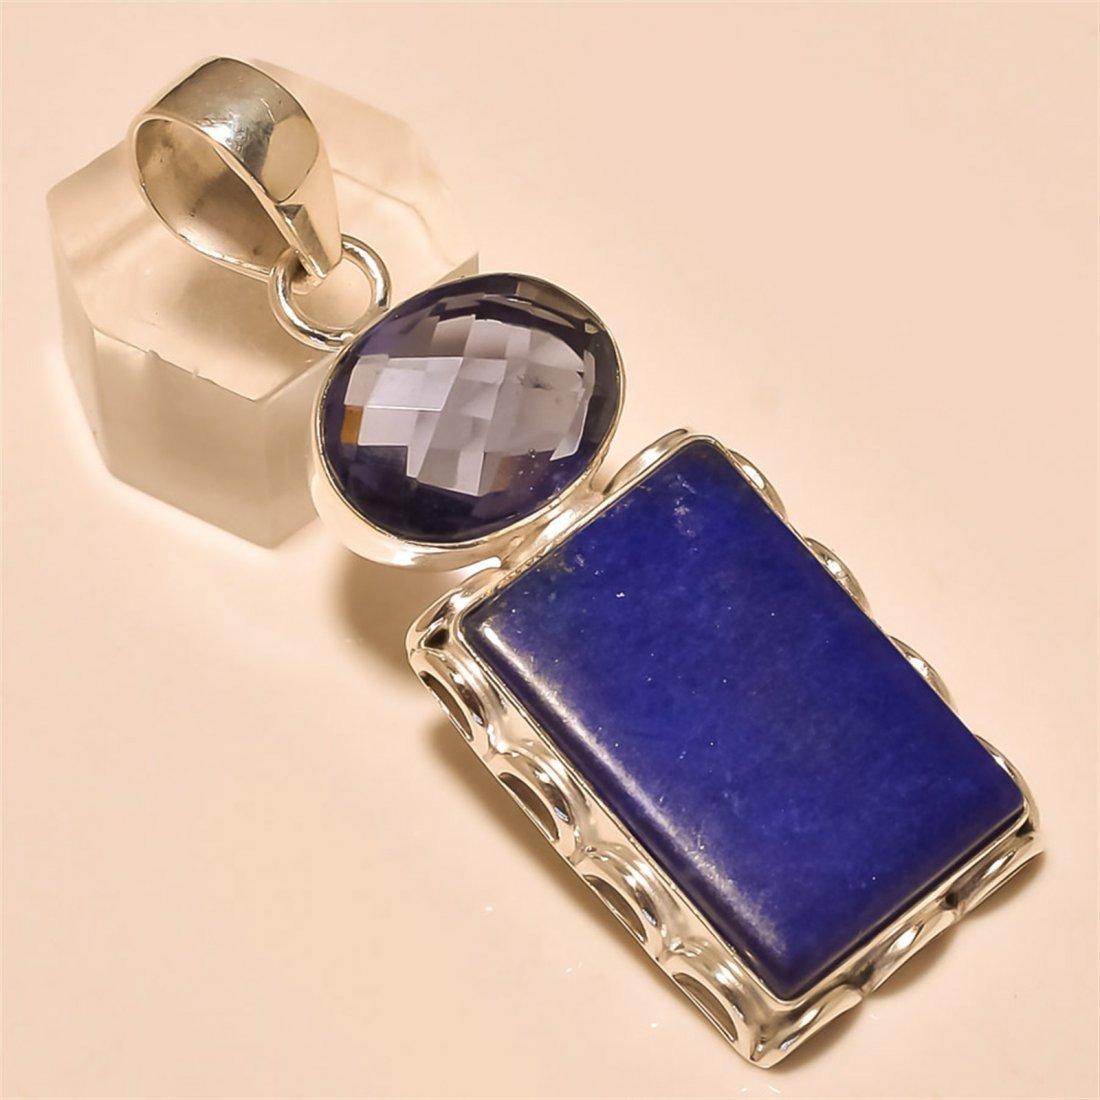 Blue Lapis/Iolite Pendant Solid Sterling Silver